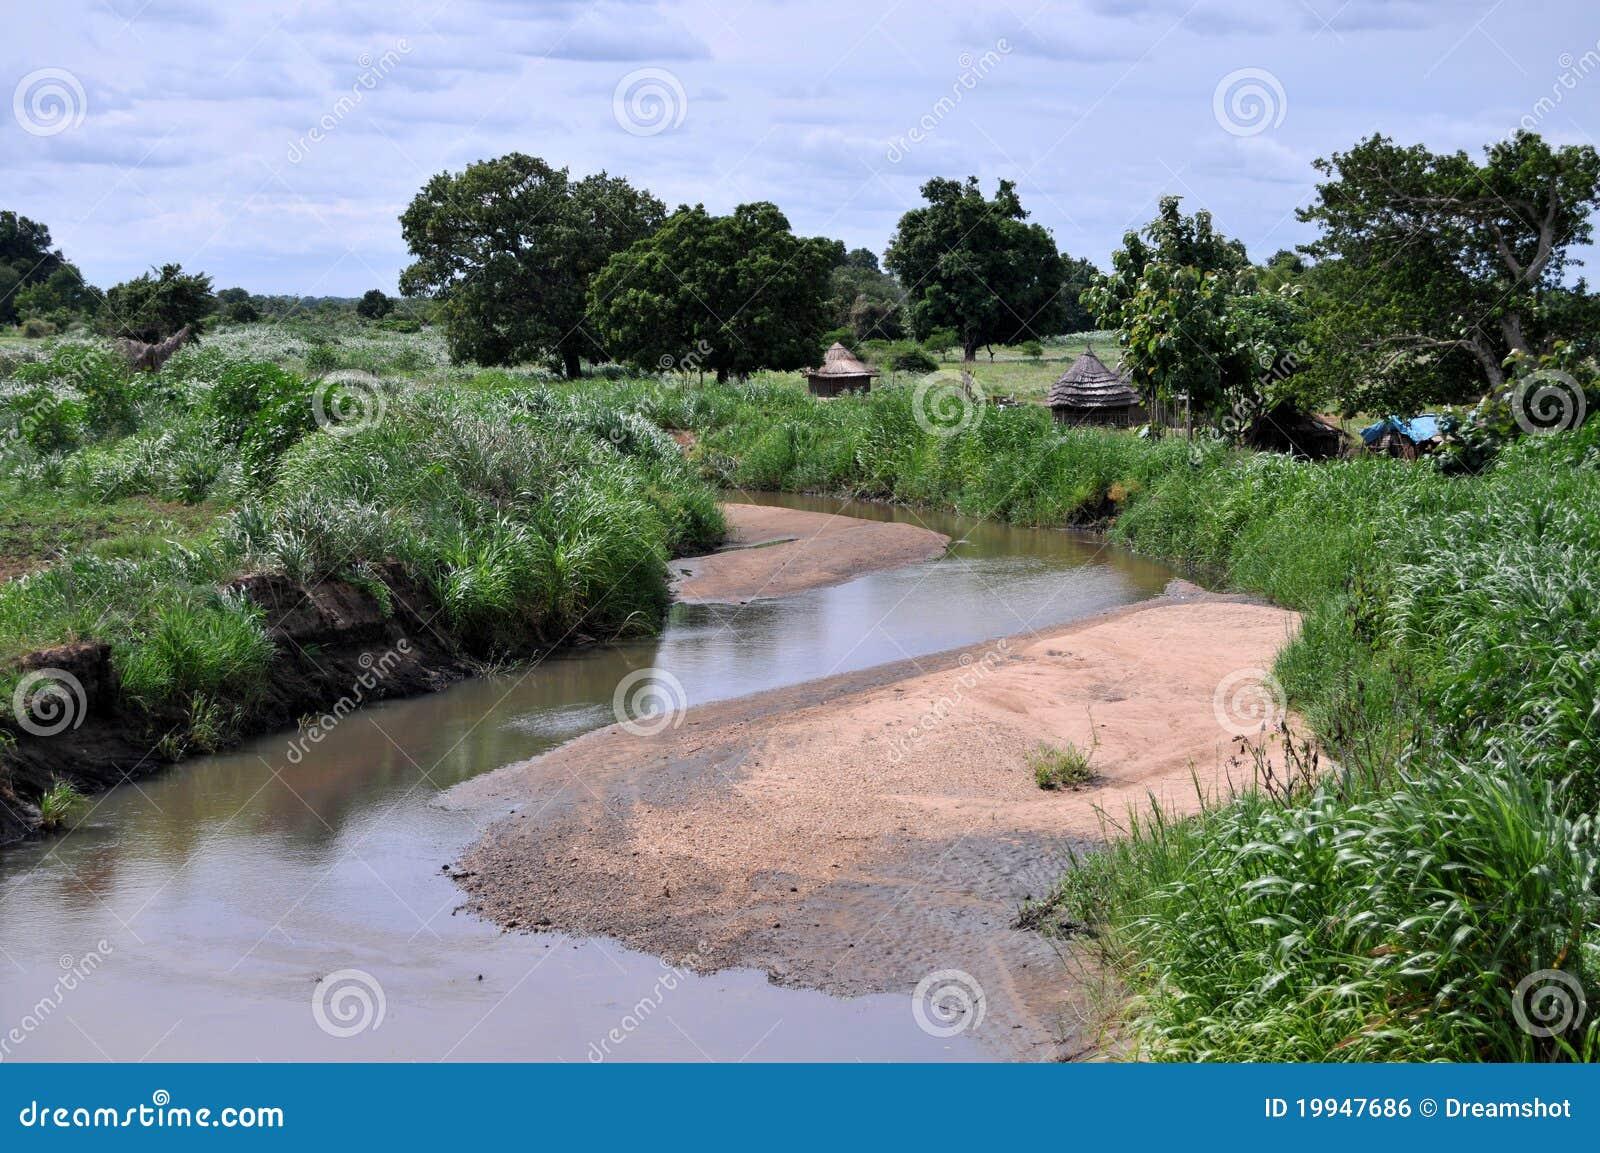 African village on riverside